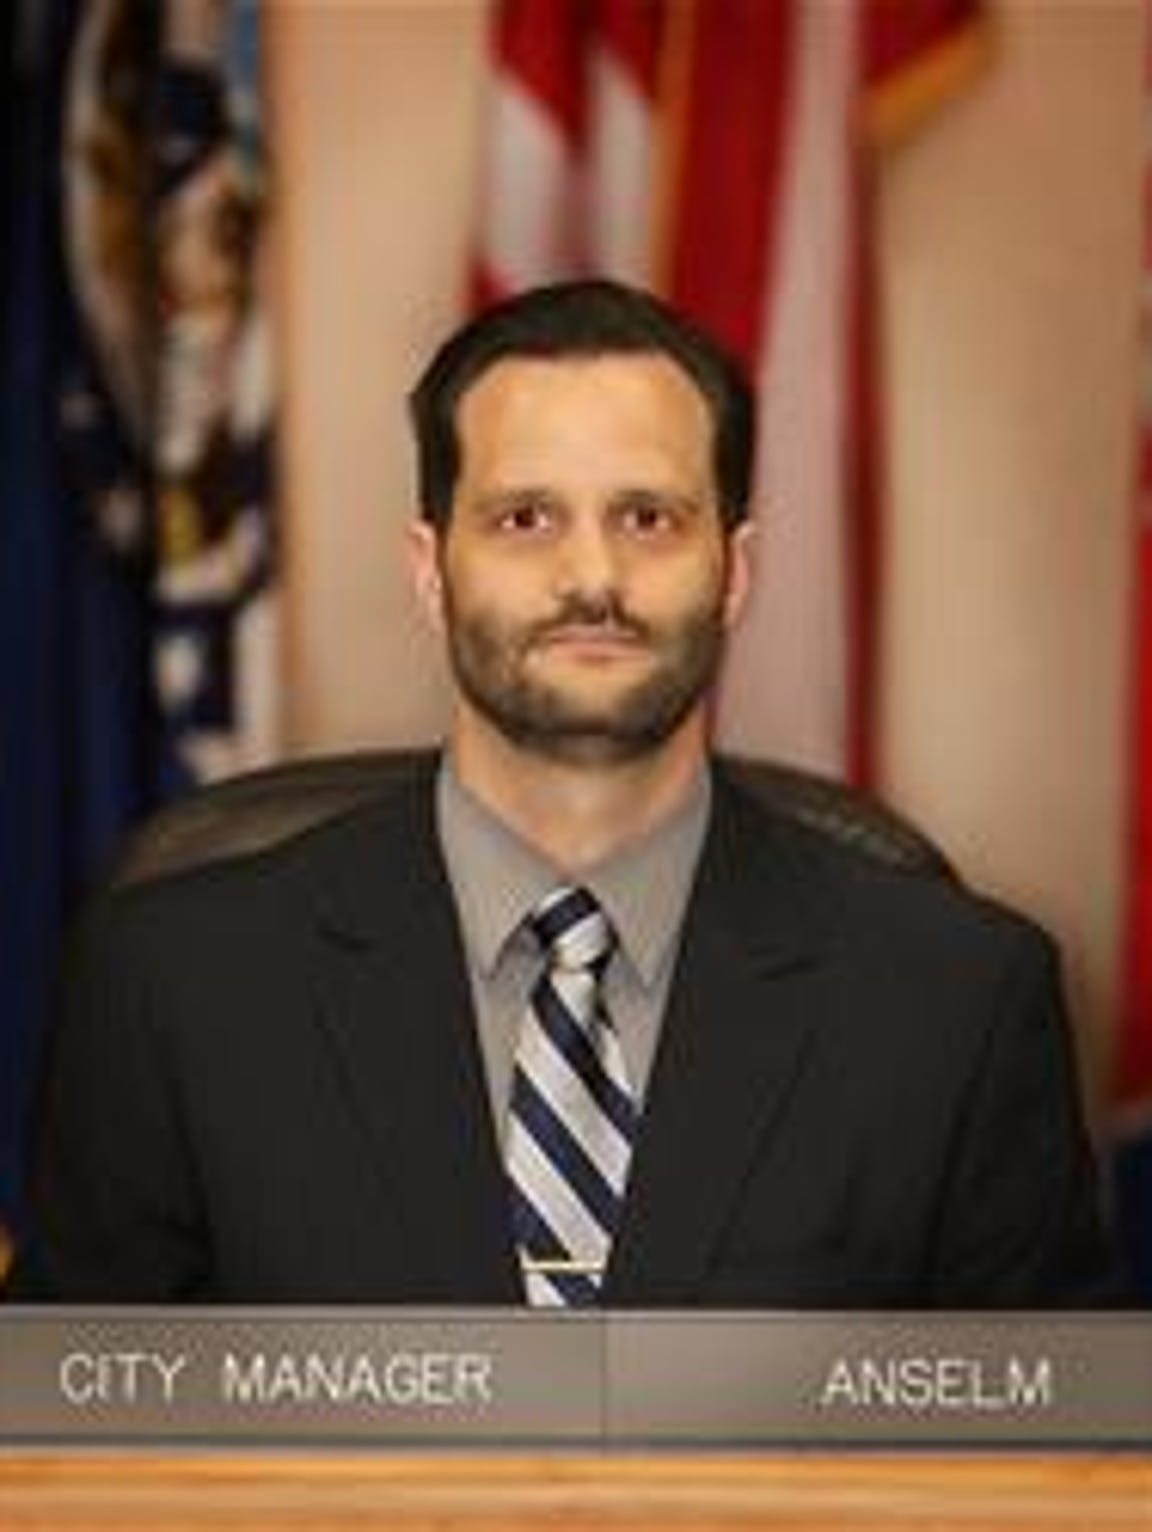 Joplin City Manager Sam Anselm